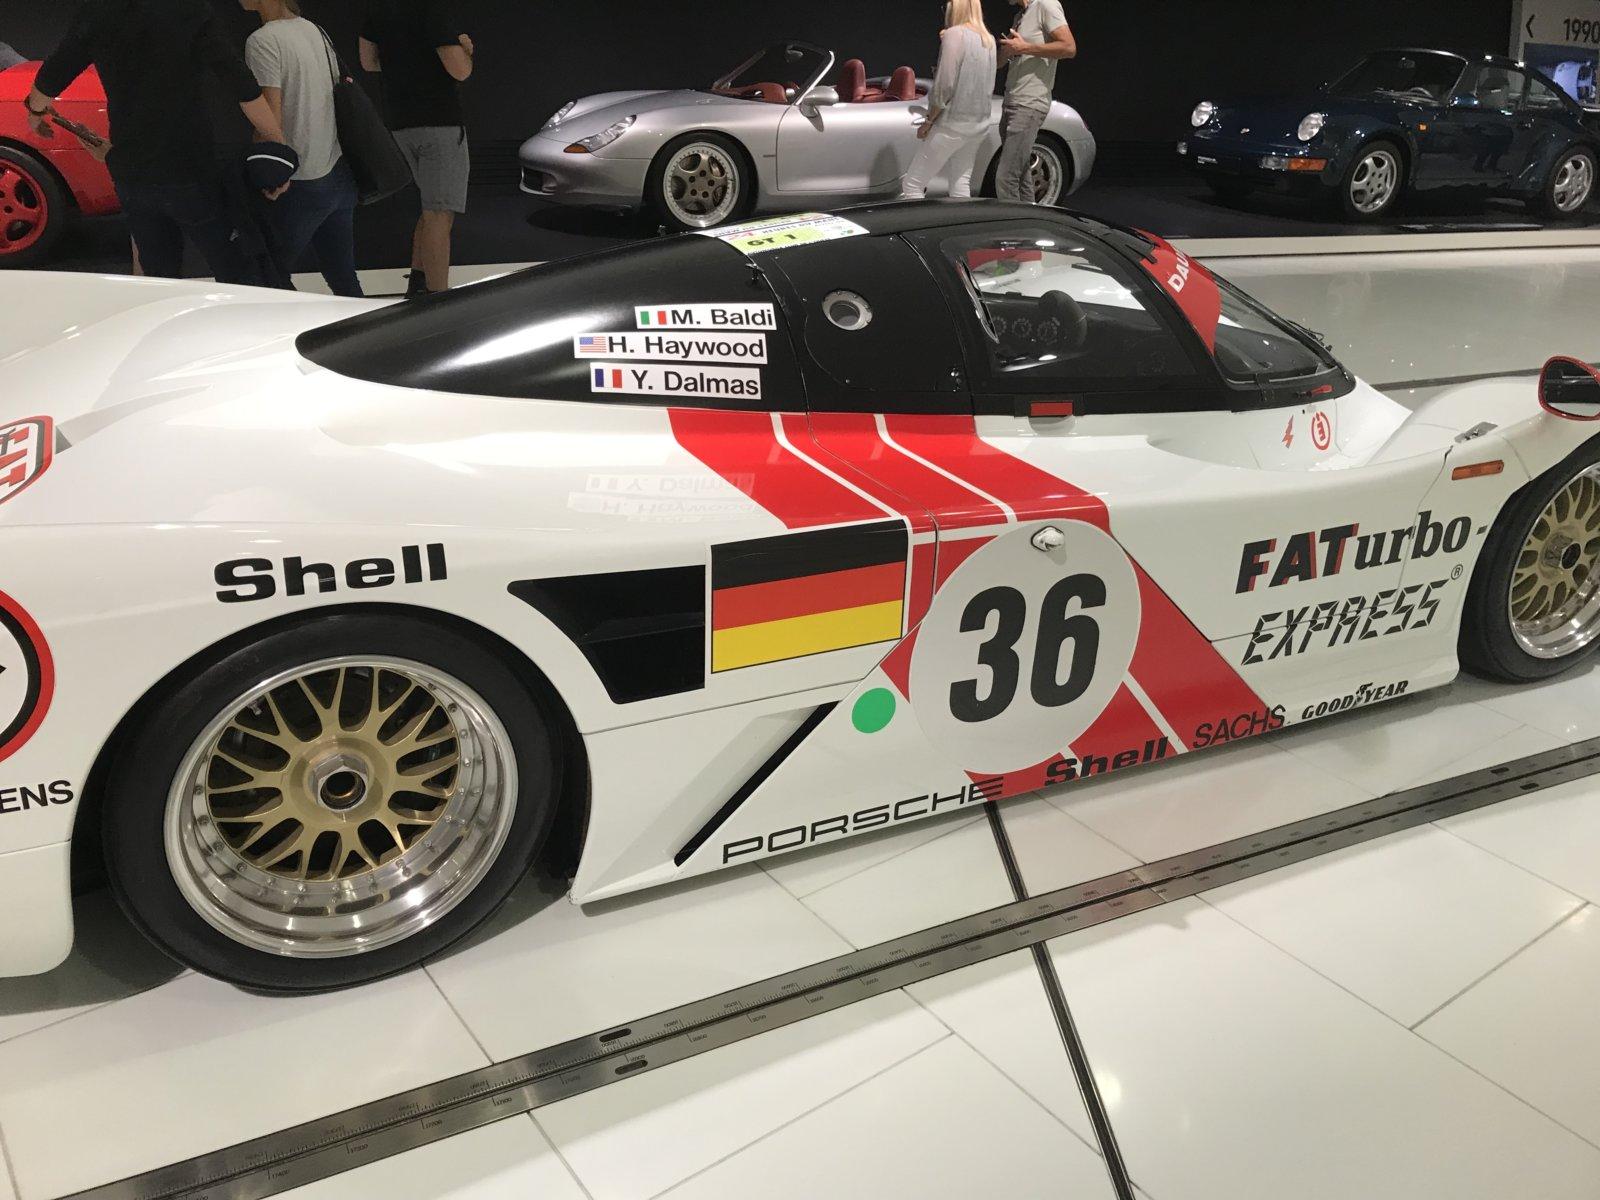 07-28 Porsche Race Car 24